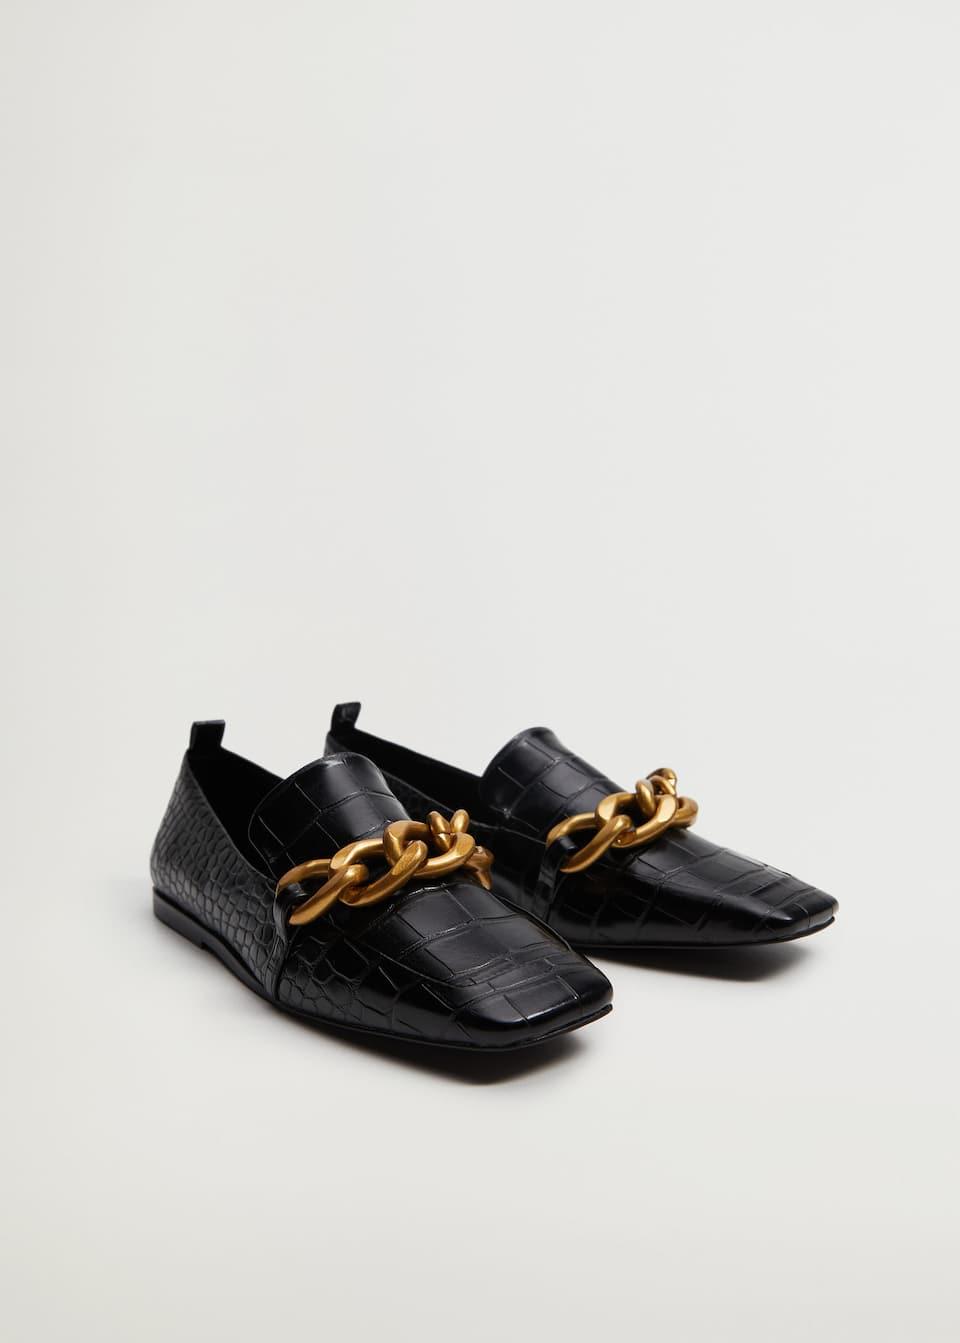 Chain loafers - Medium plane